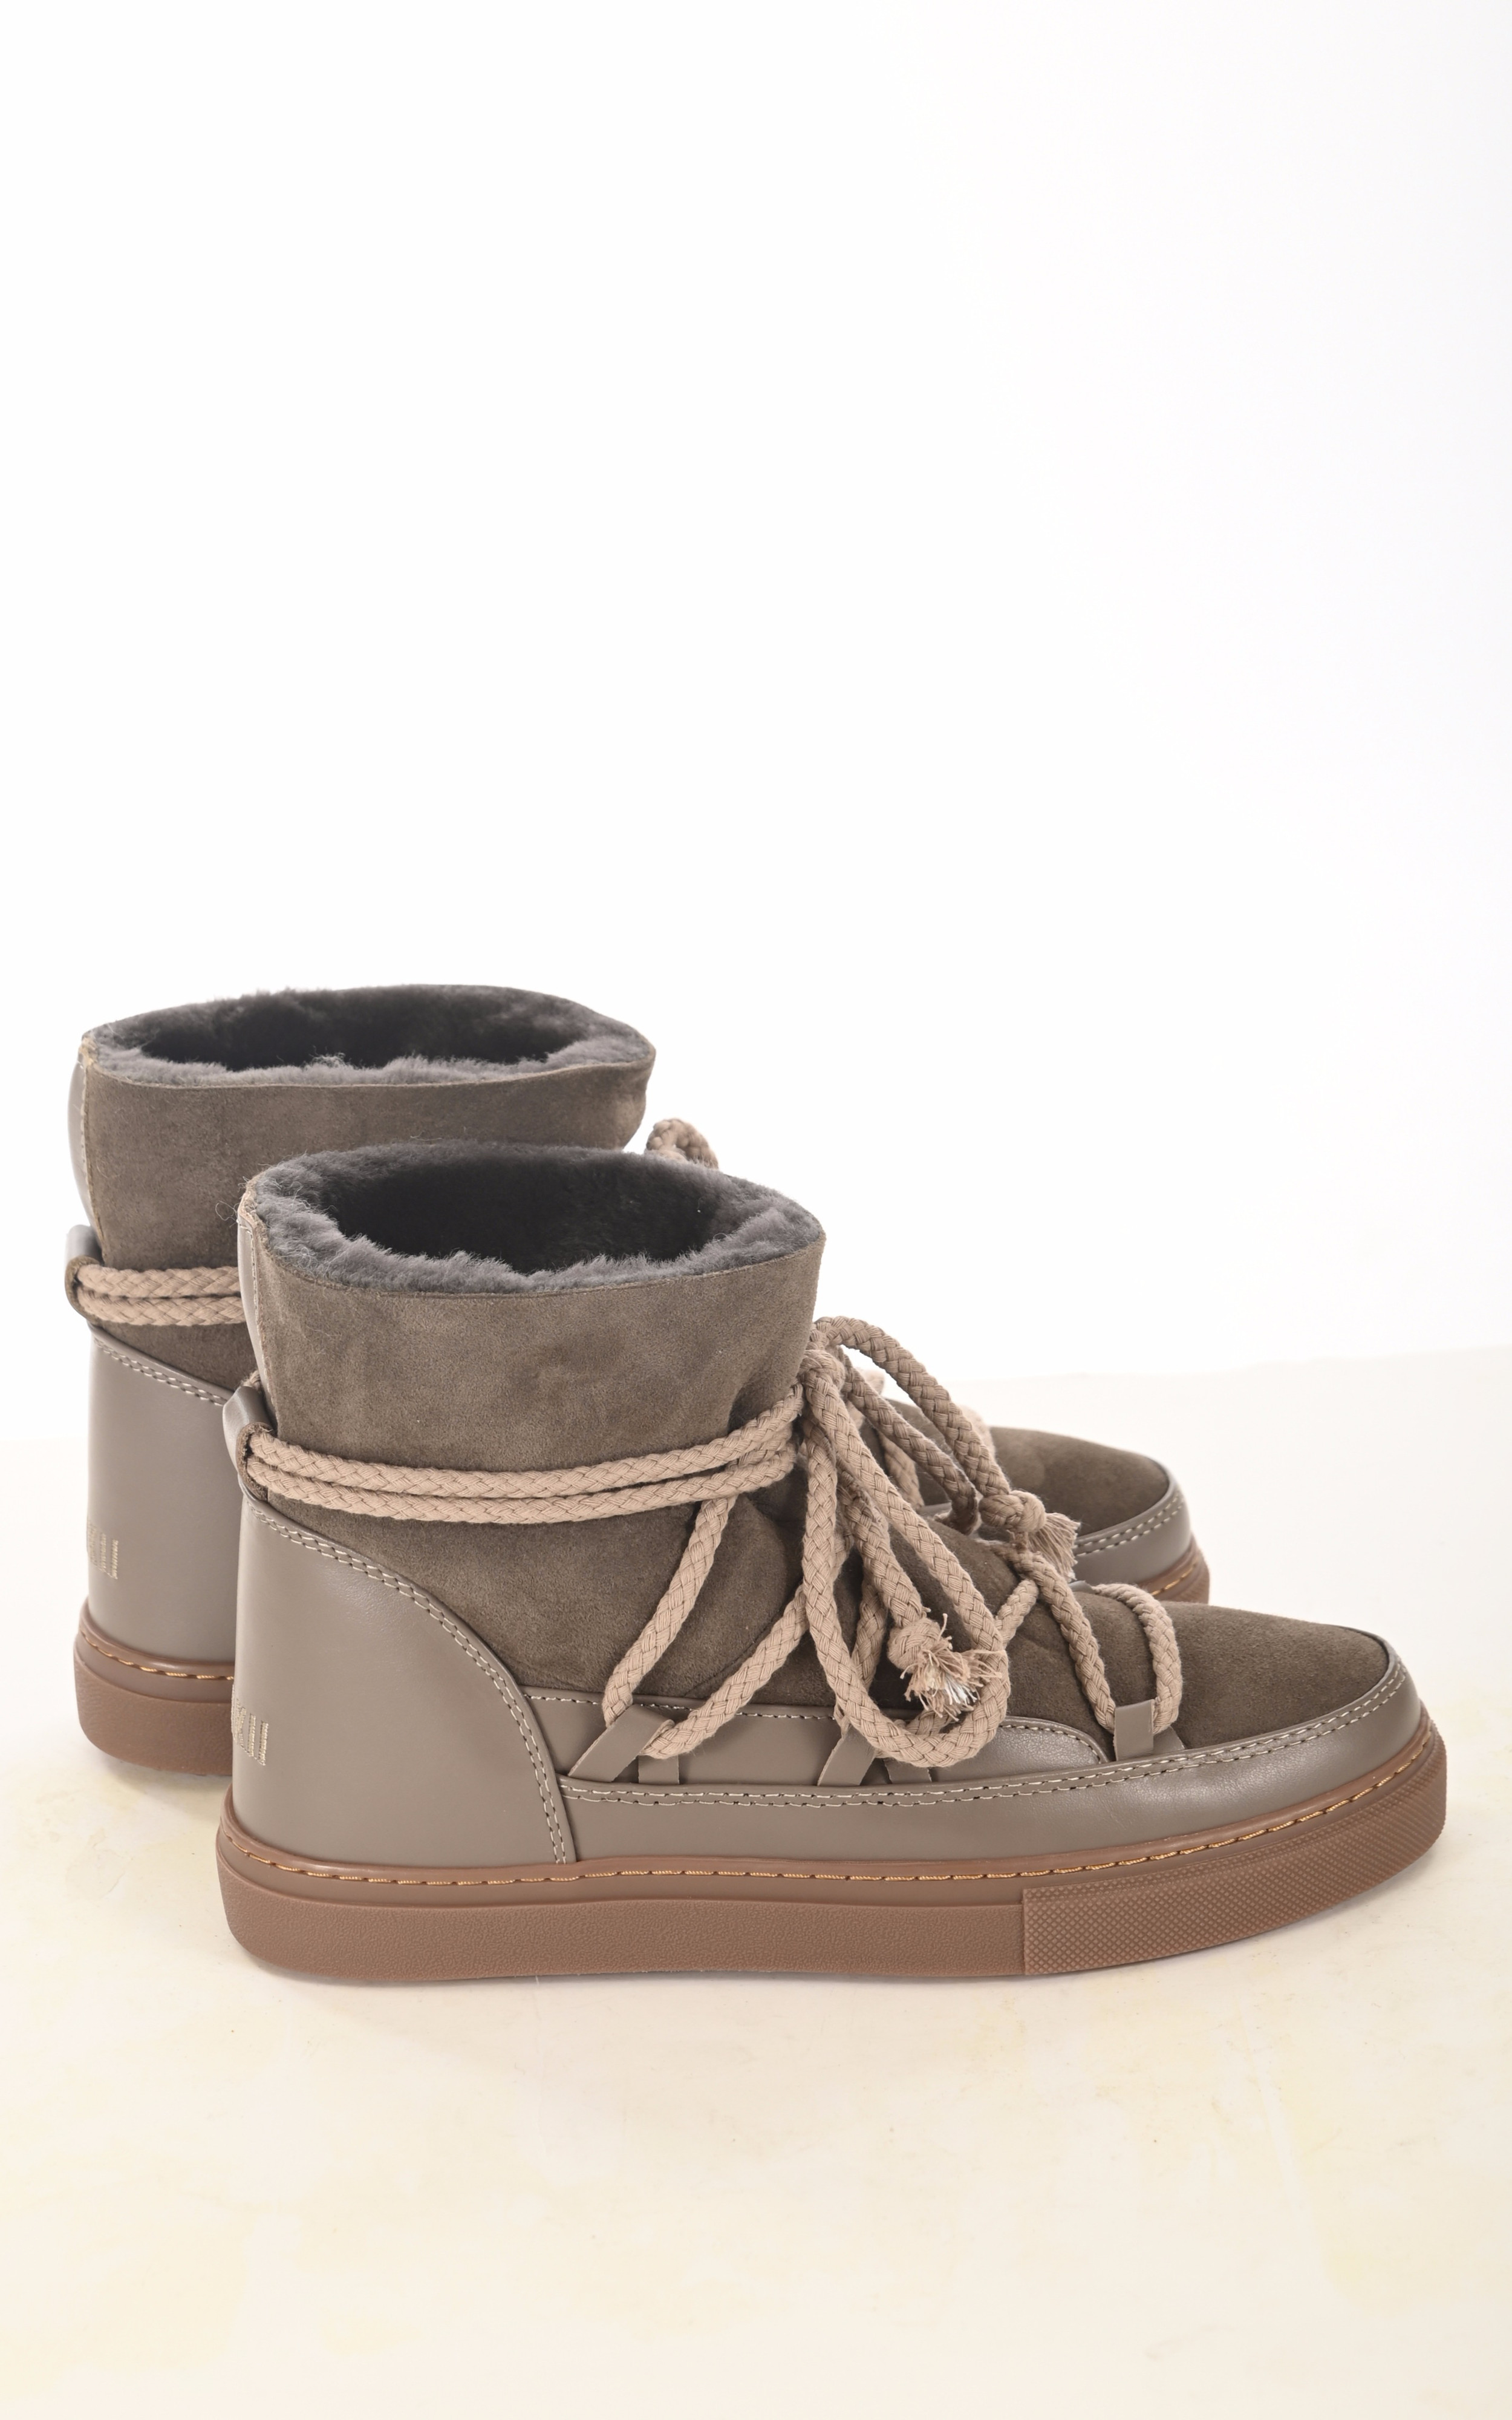 Boots Classic taupe Inuikii